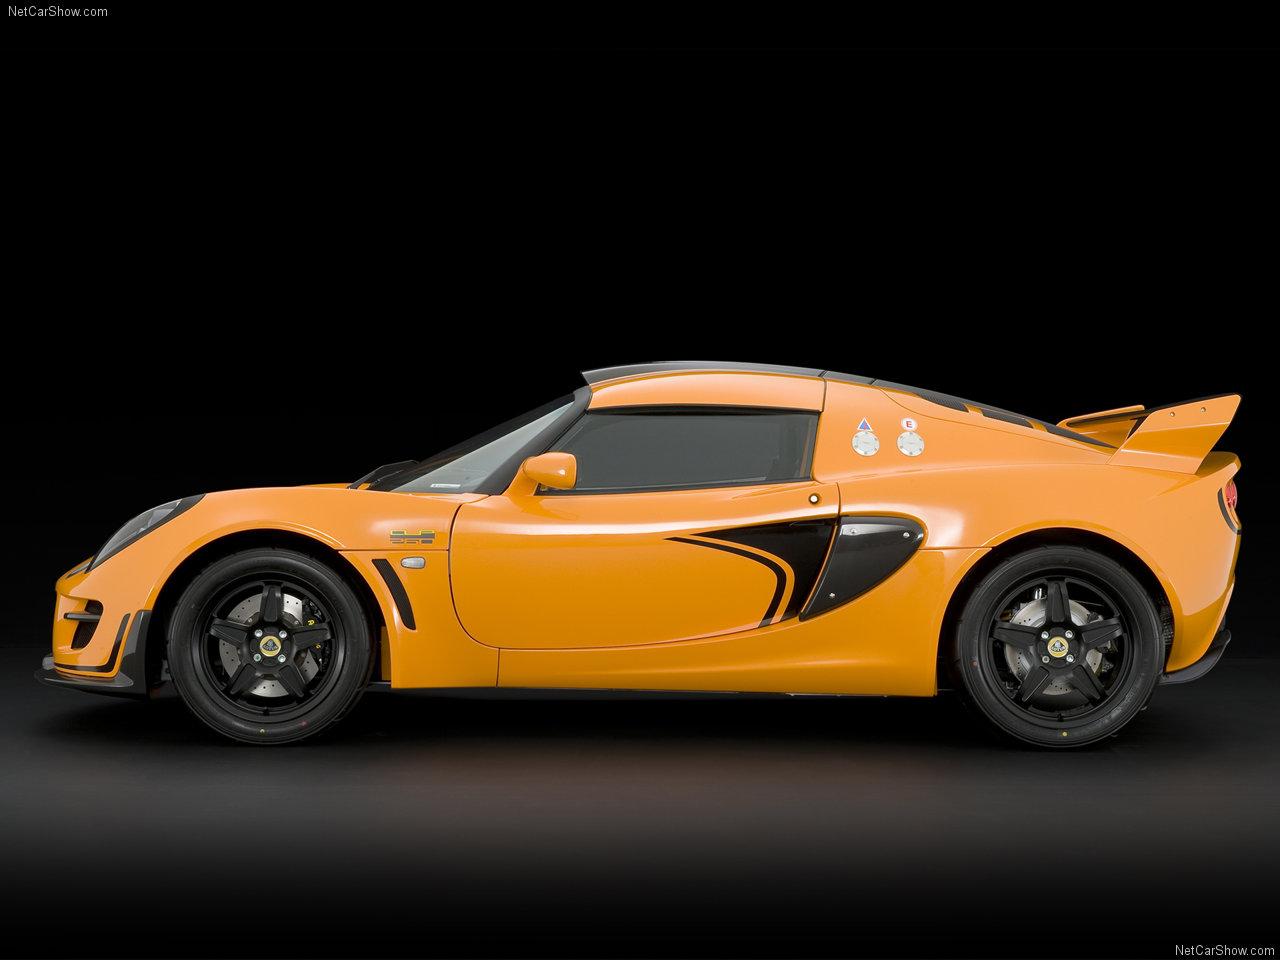 2010 lotus exige cup 260 automobile. Black Bedroom Furniture Sets. Home Design Ideas